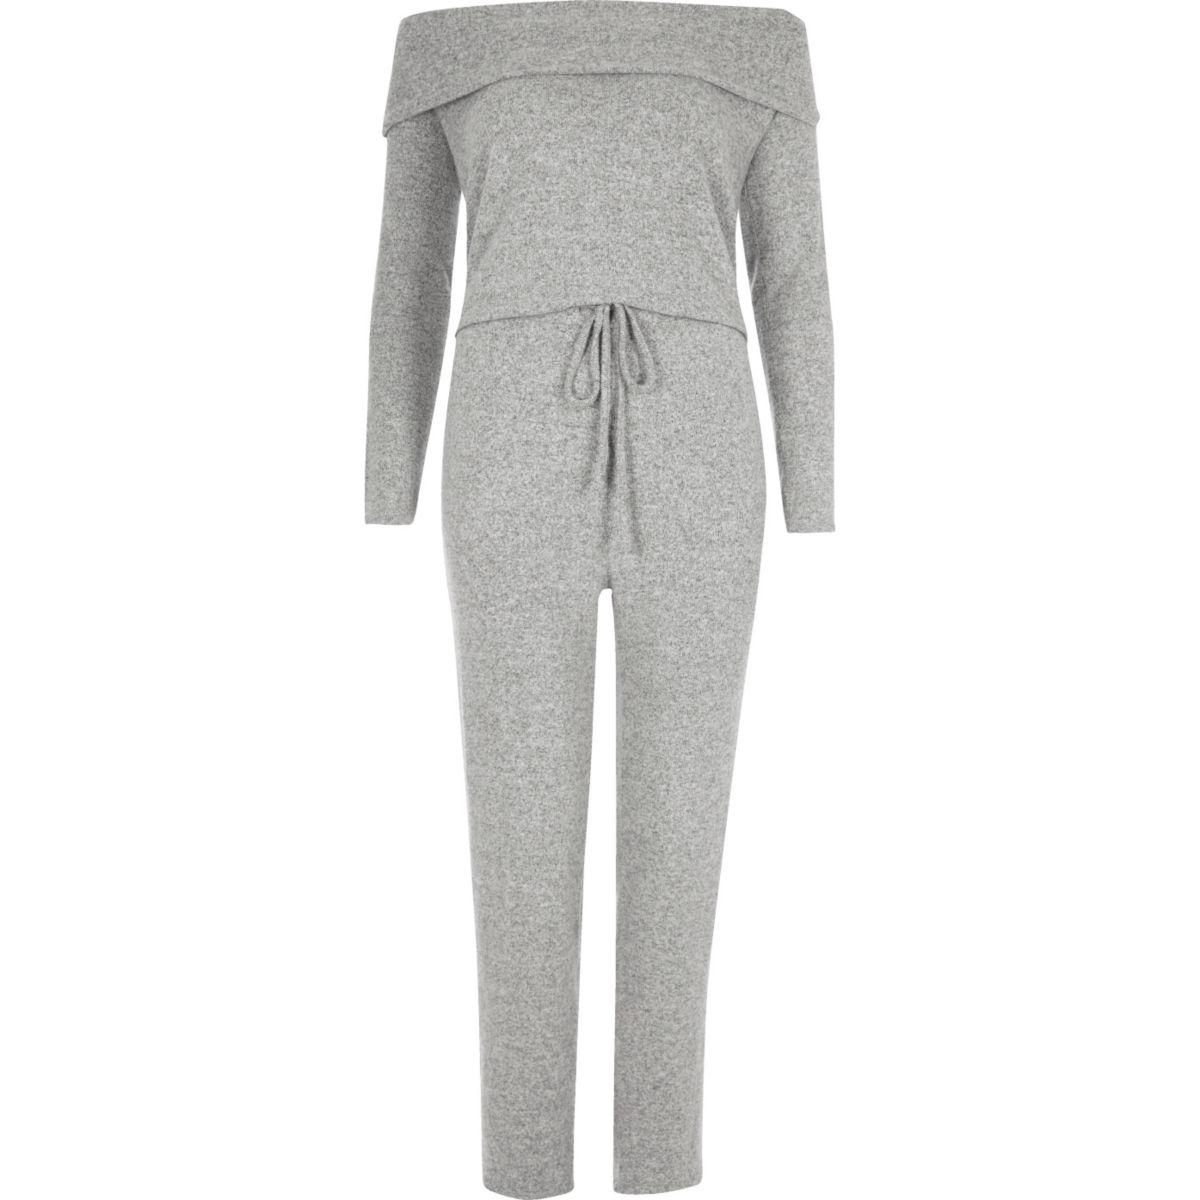 Grey marl bardot jumpsuit